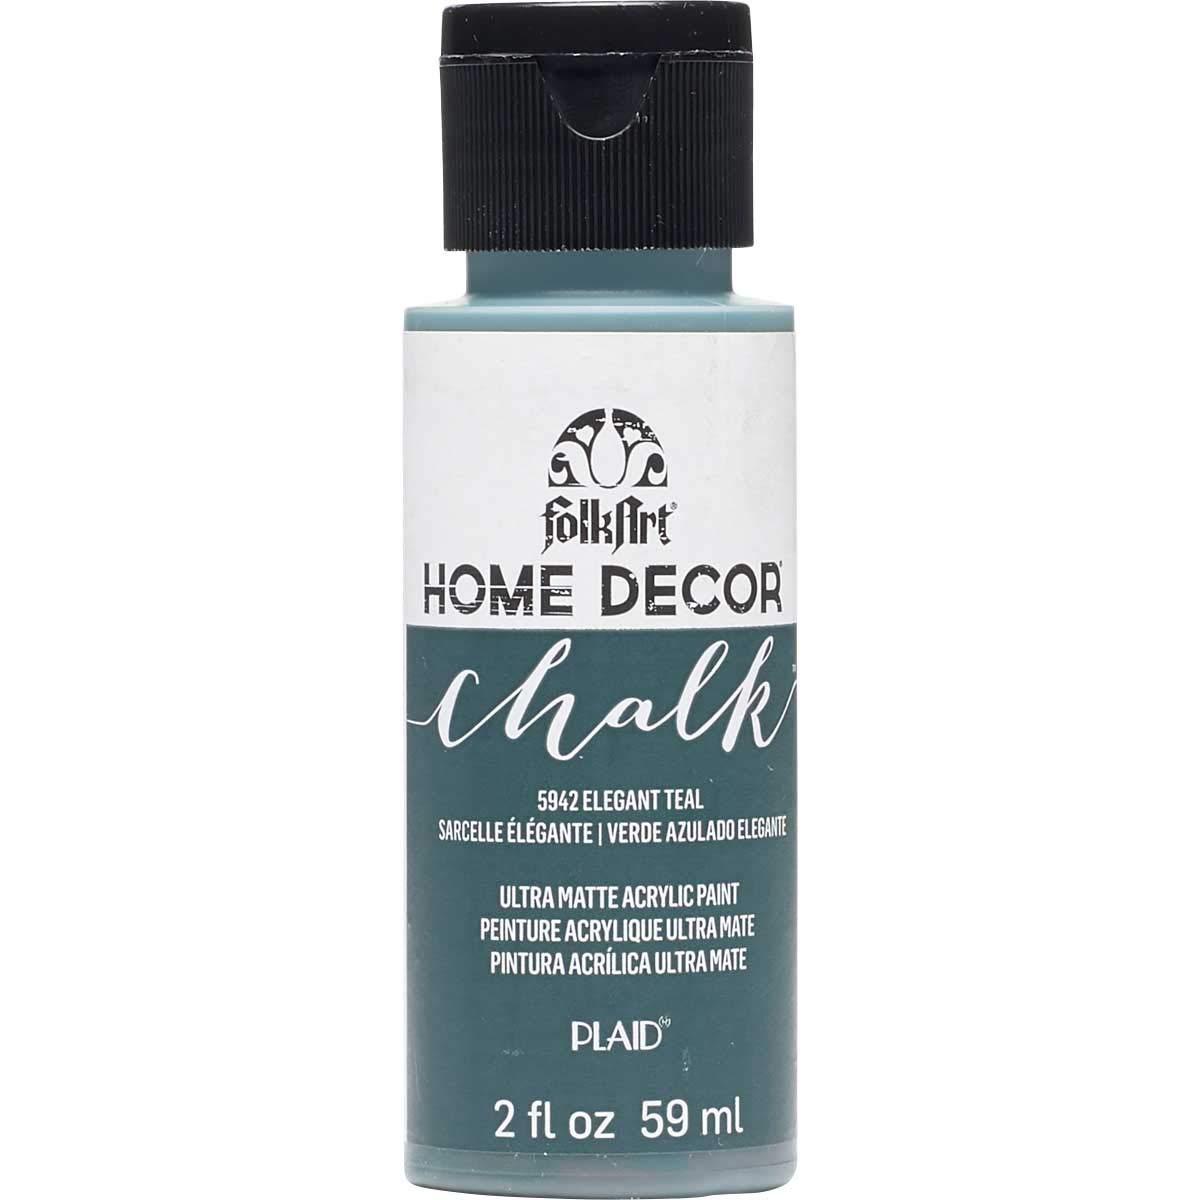 FolkArt 5942 Home Décor Chalk Furniture & Craft Paint in Assorted Colors, 2 oz, Elegant Teal